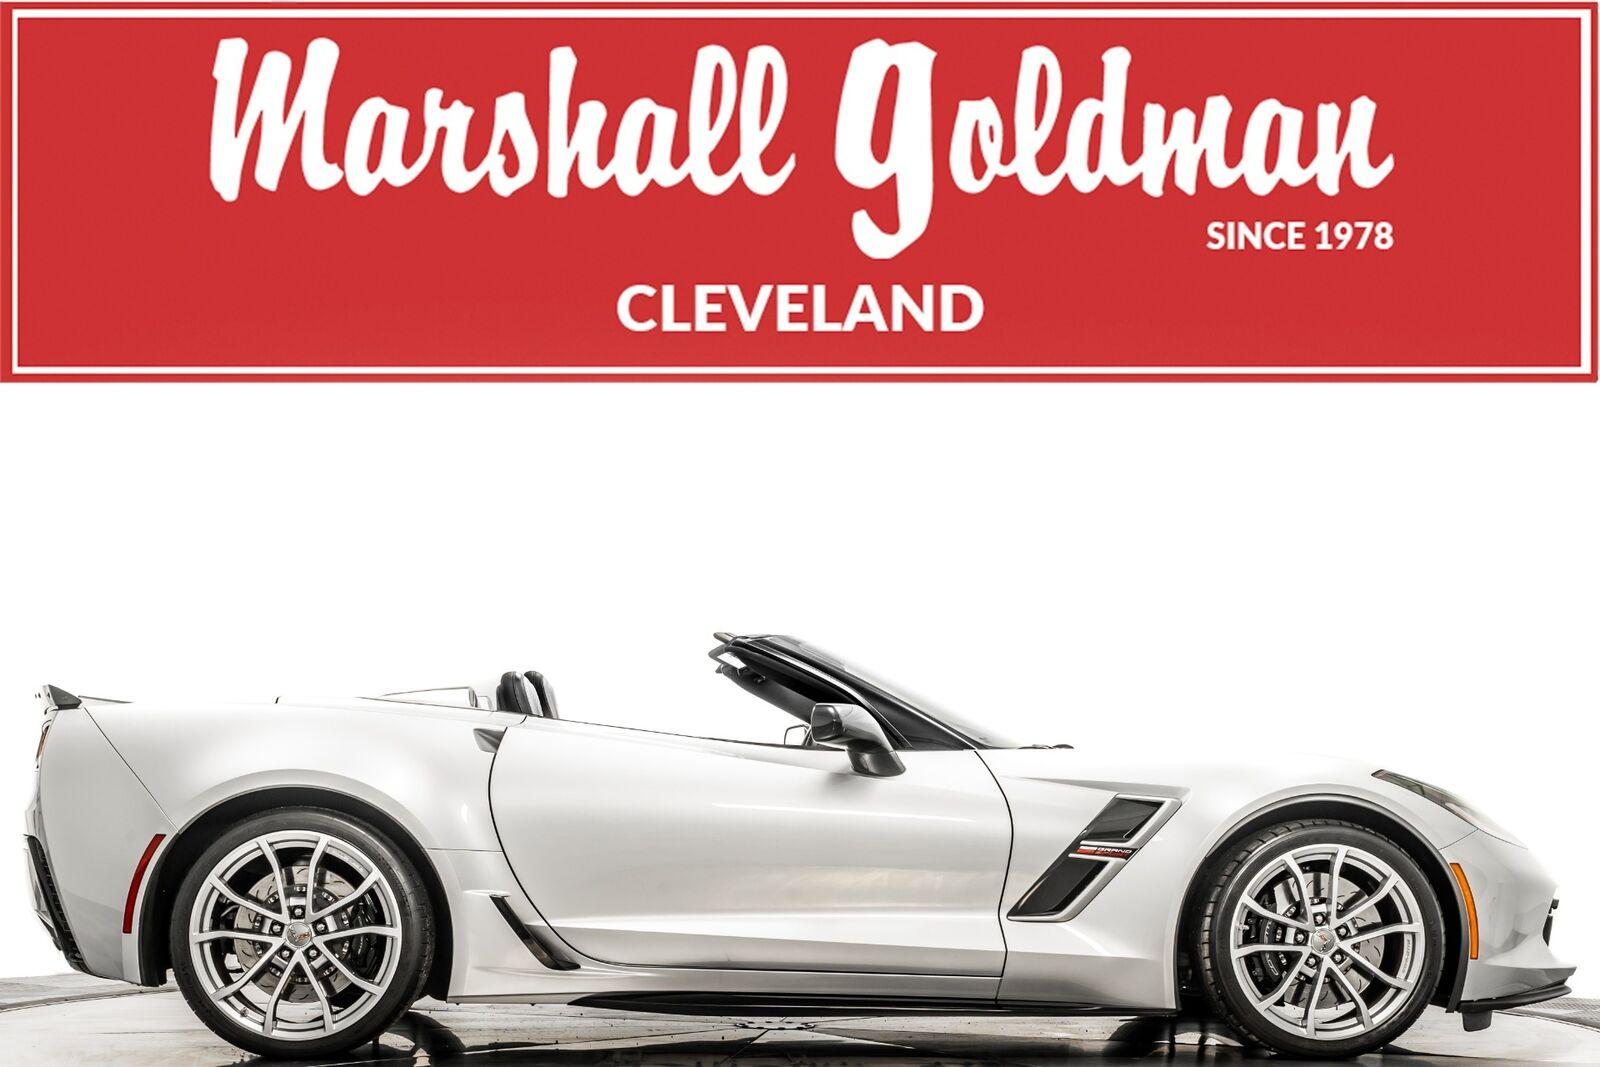 2019 Silver Chevrolet Corvette Grand Sport 2LT | C7 Corvette Photo 1